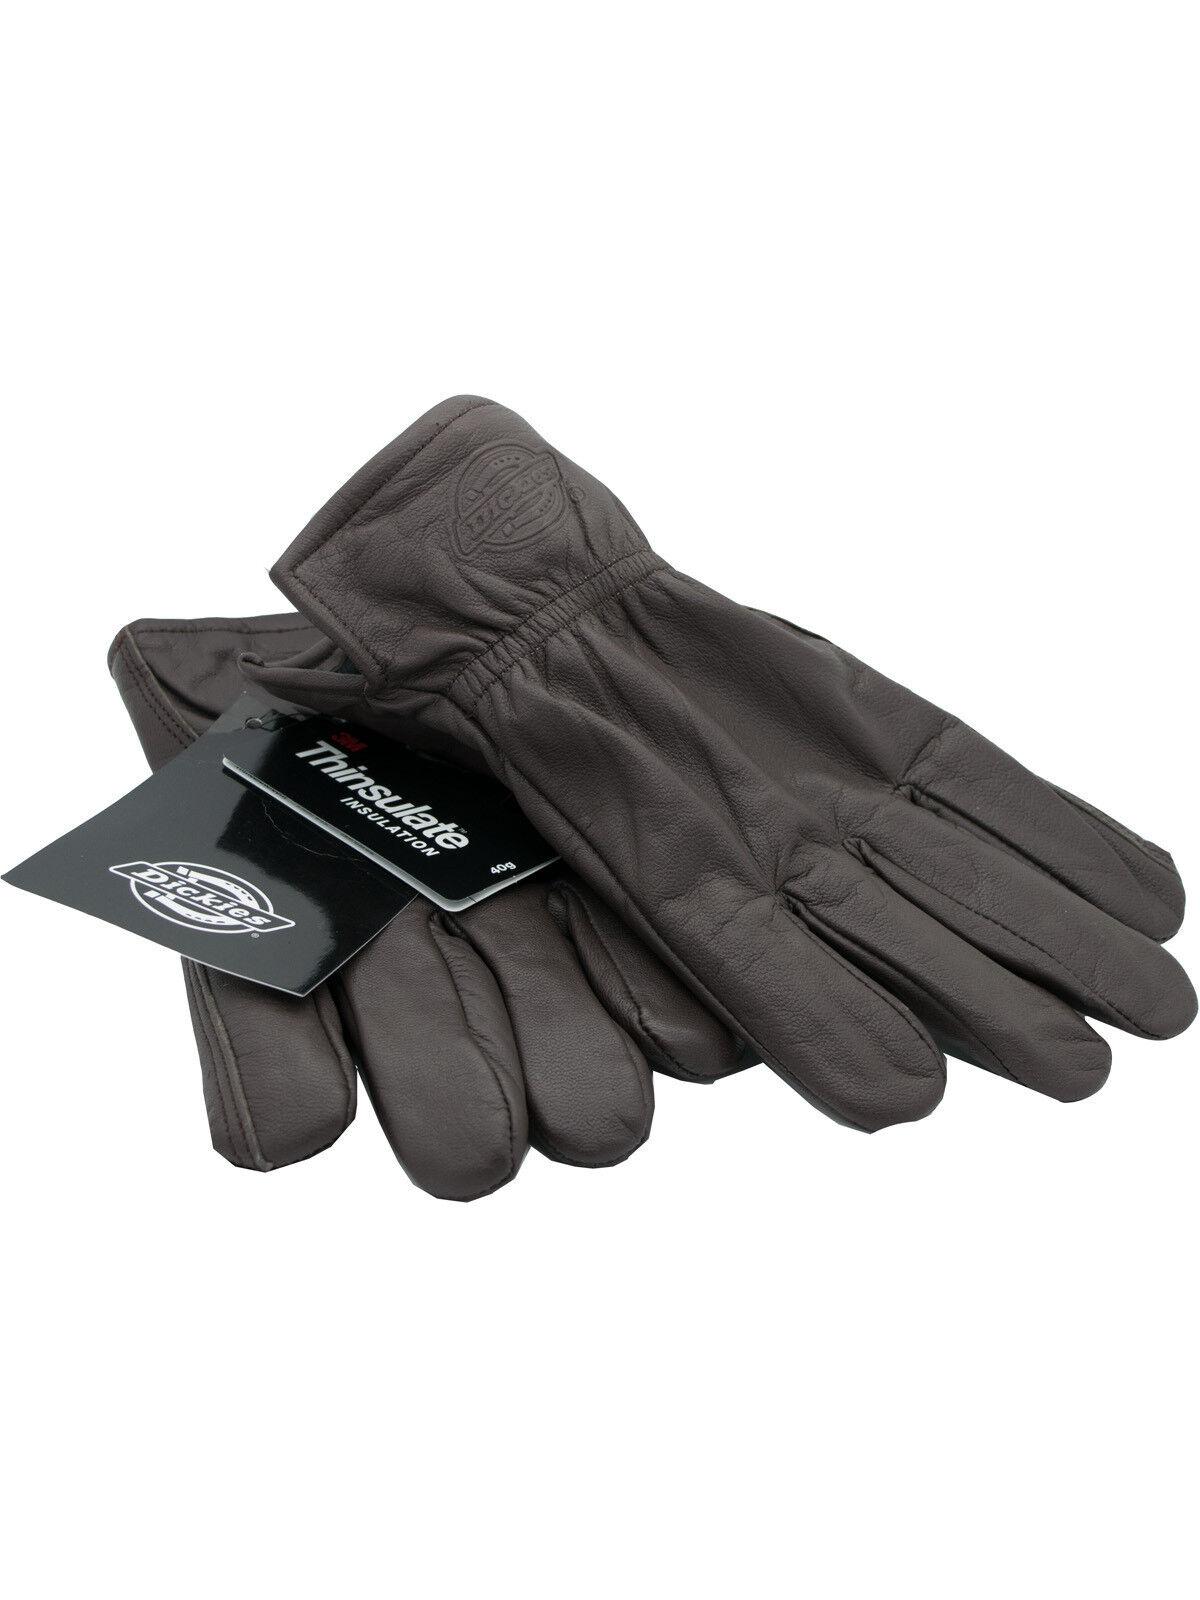 Dickies Gloves/Leather Gloves Dark Brown/Work Gloves Memphis 5032